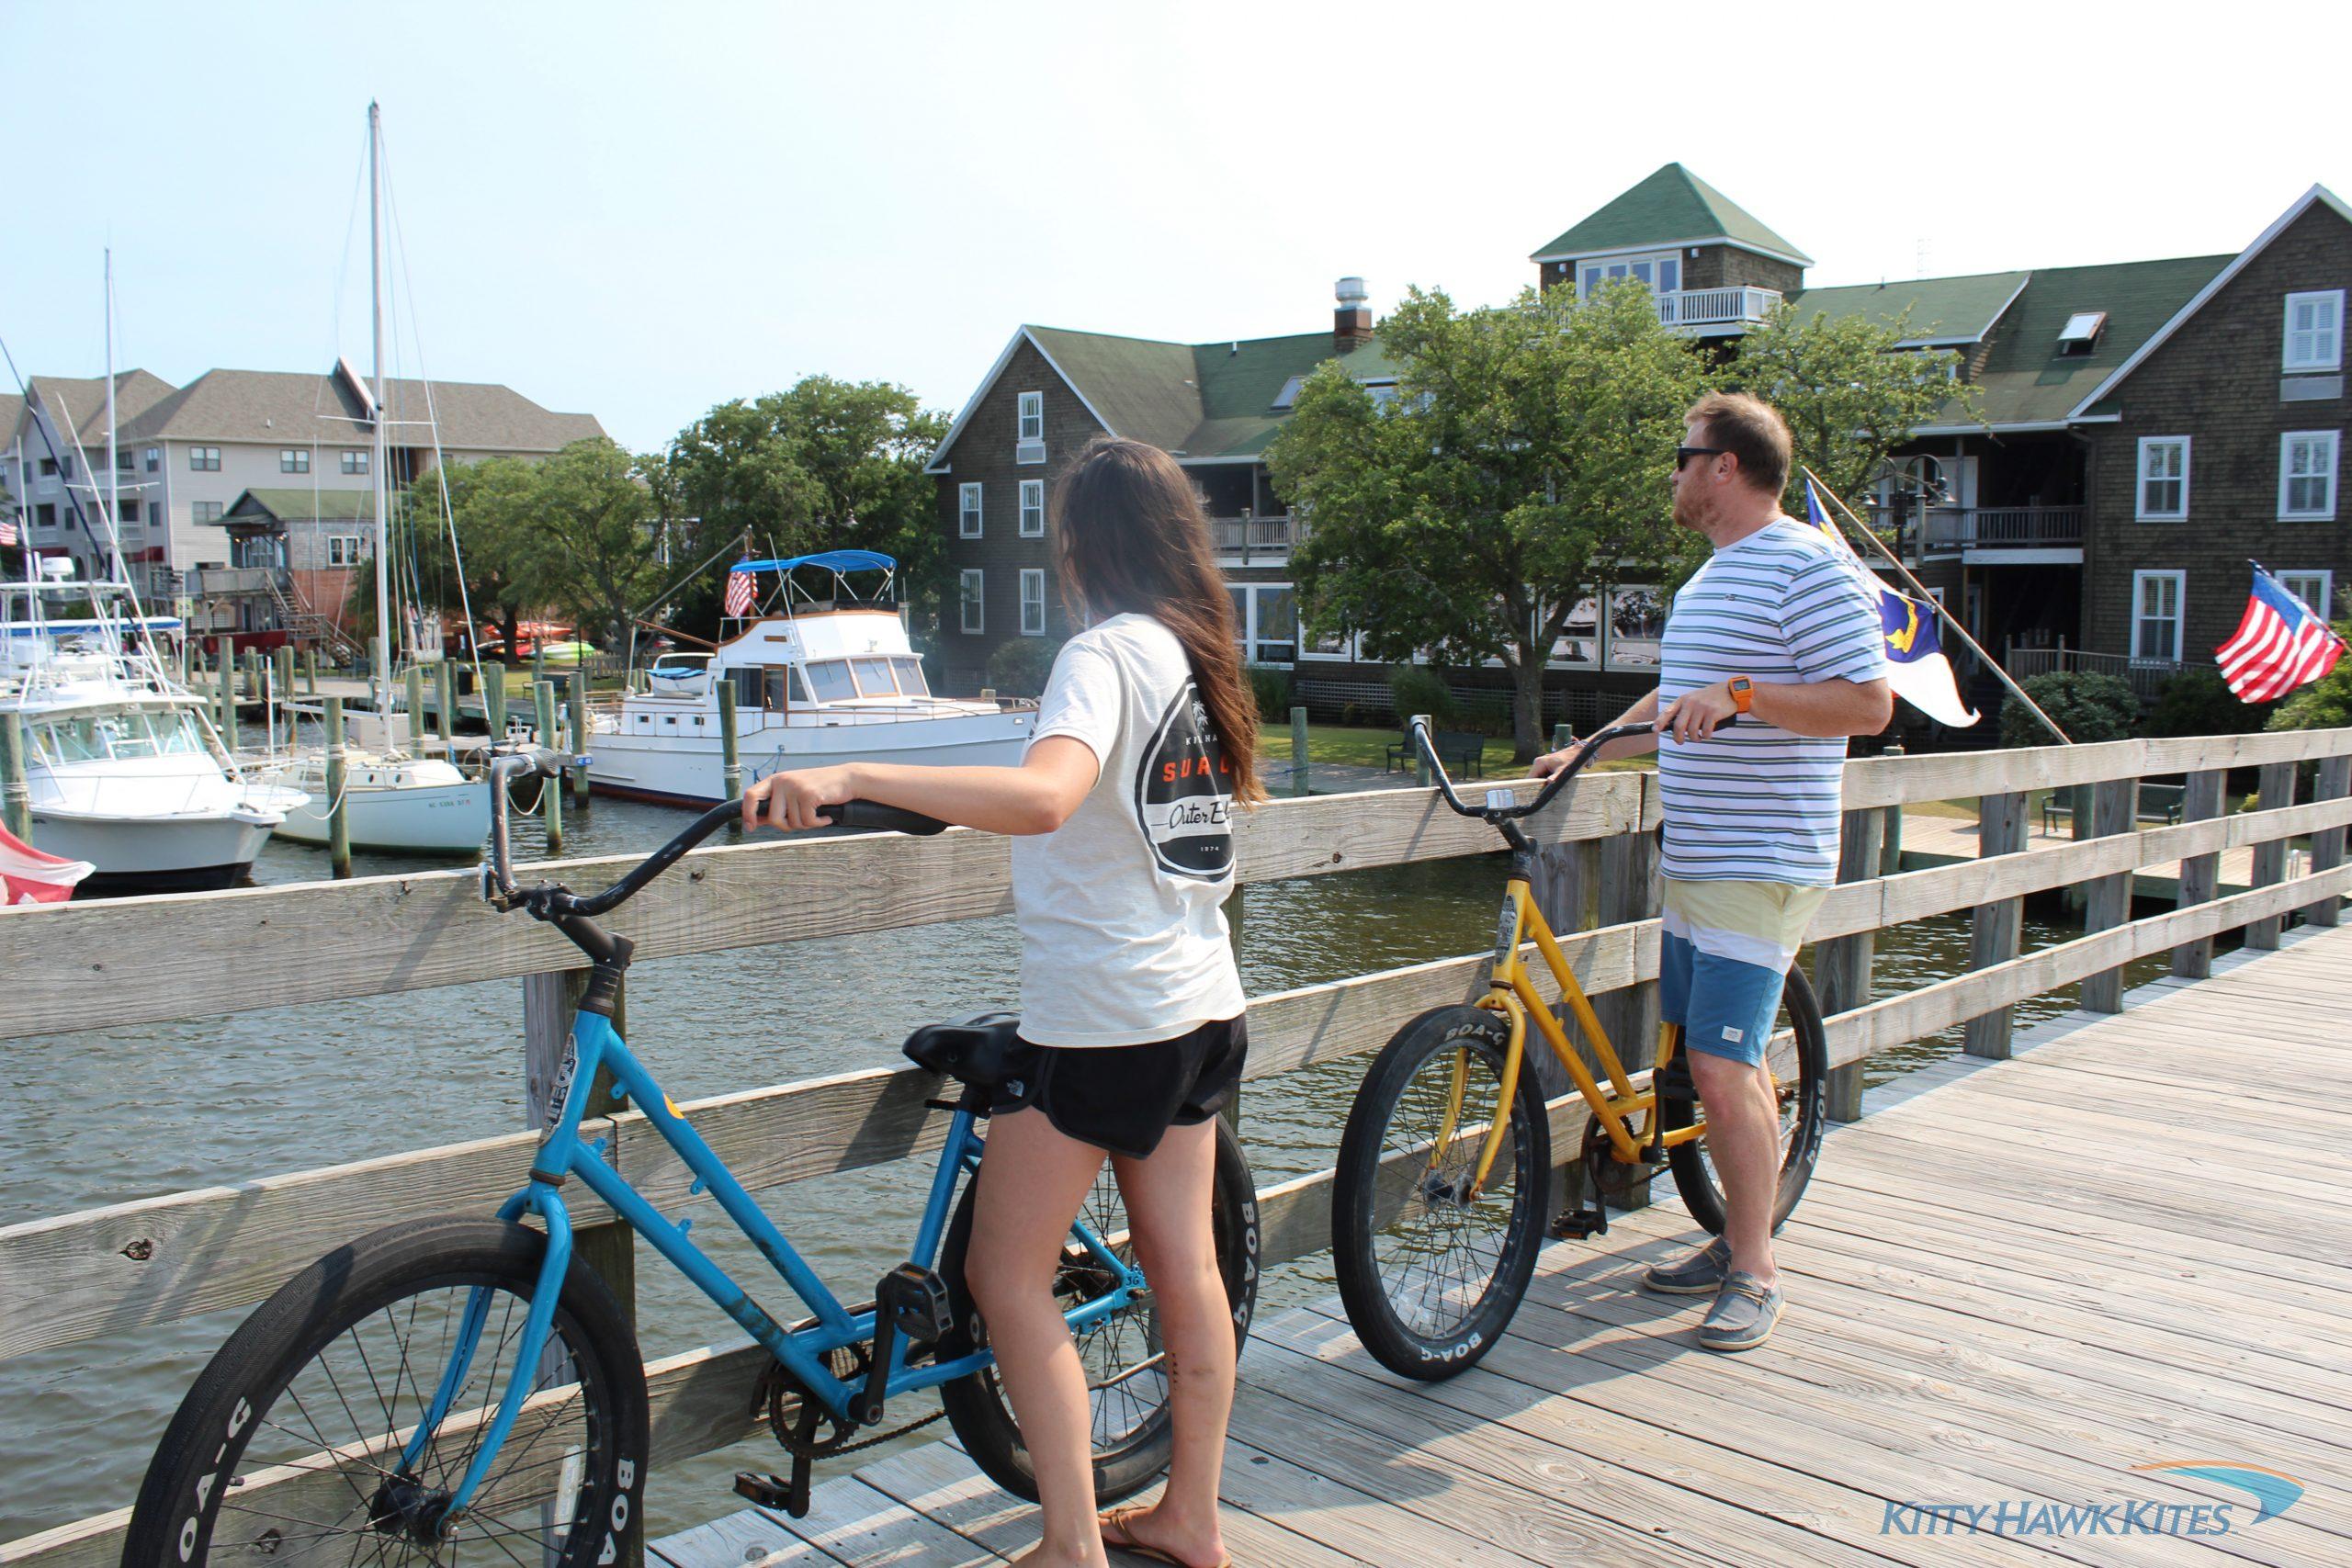 Riding bikes in Manteo